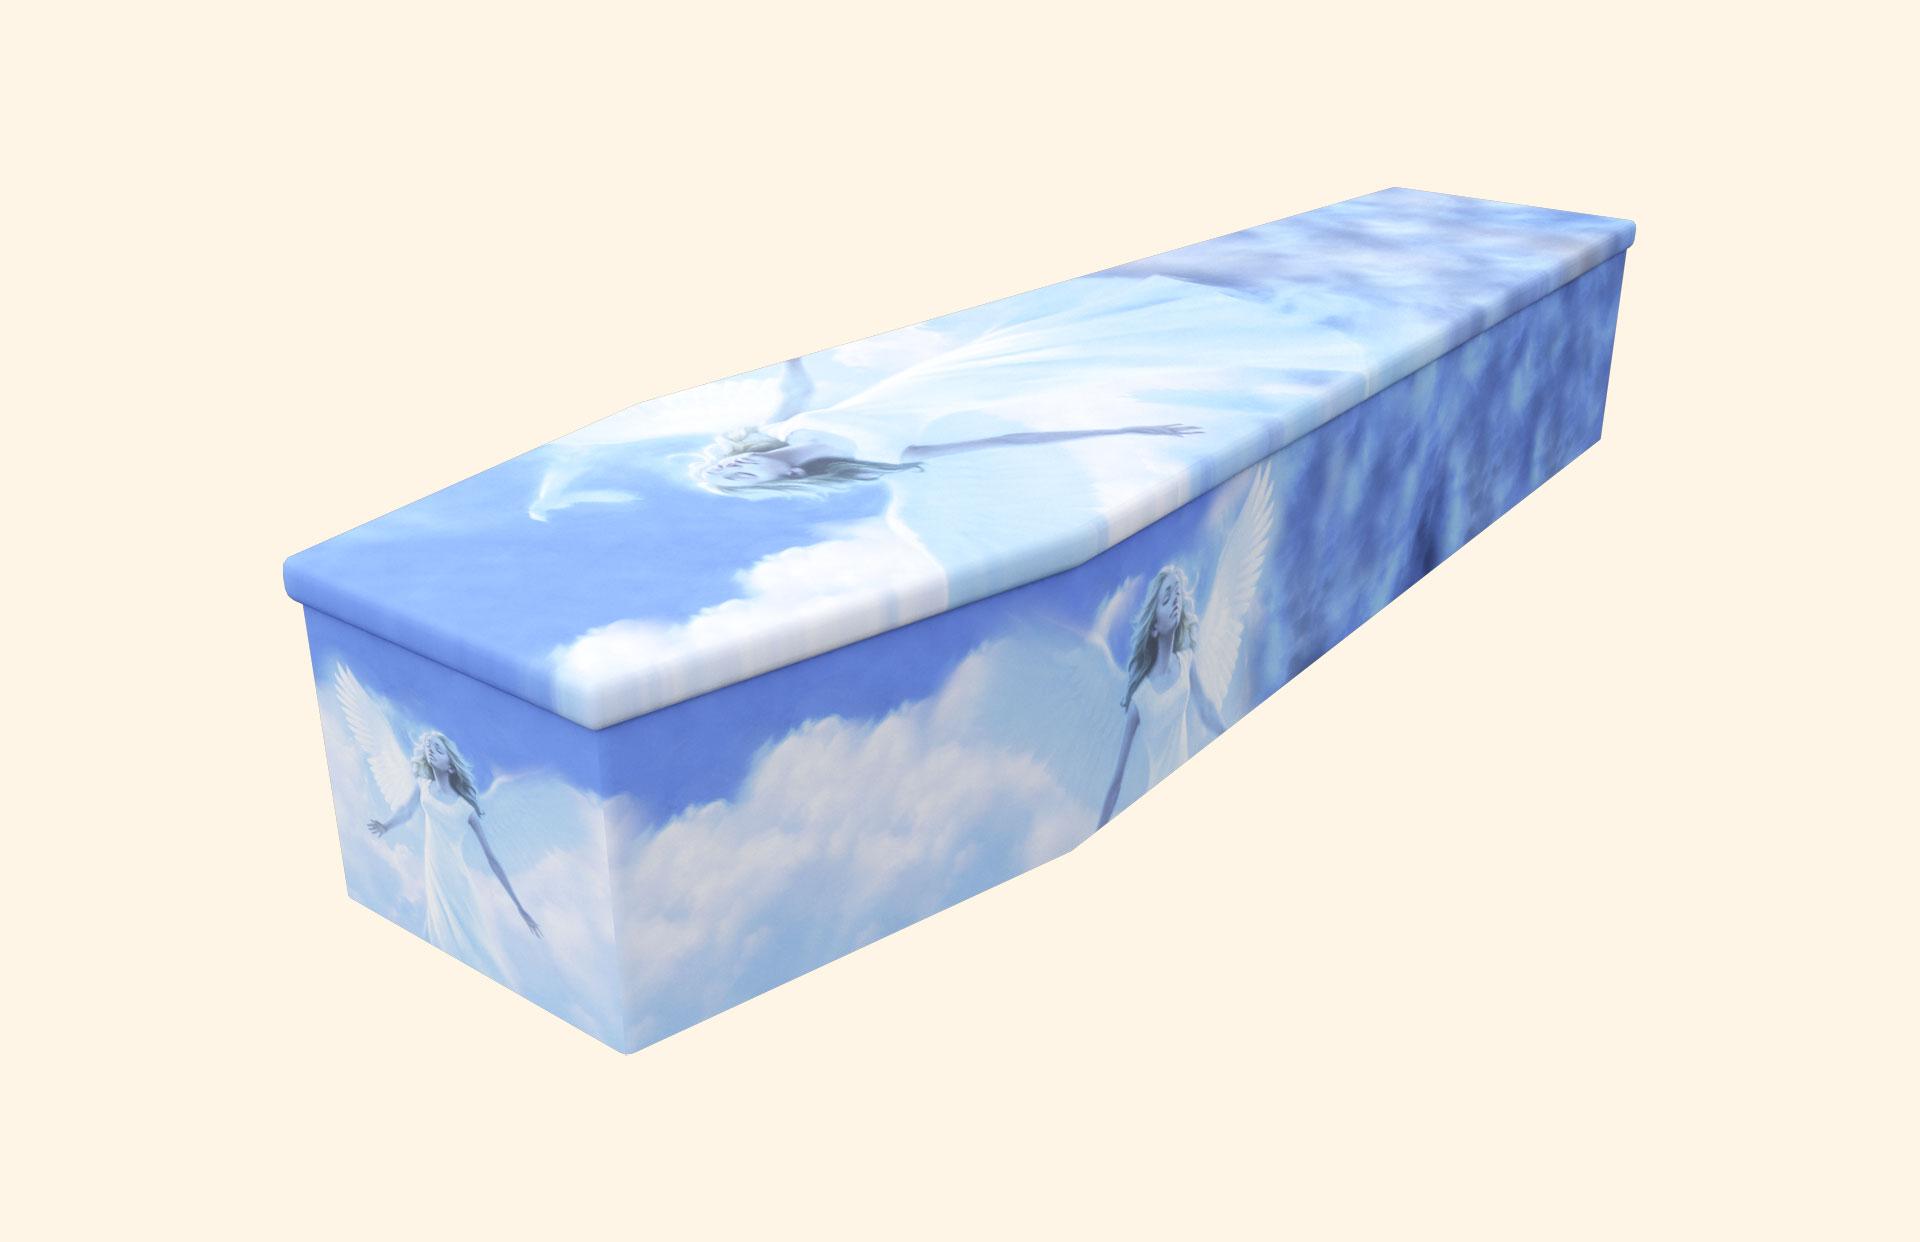 My Angel Cardboard coffin